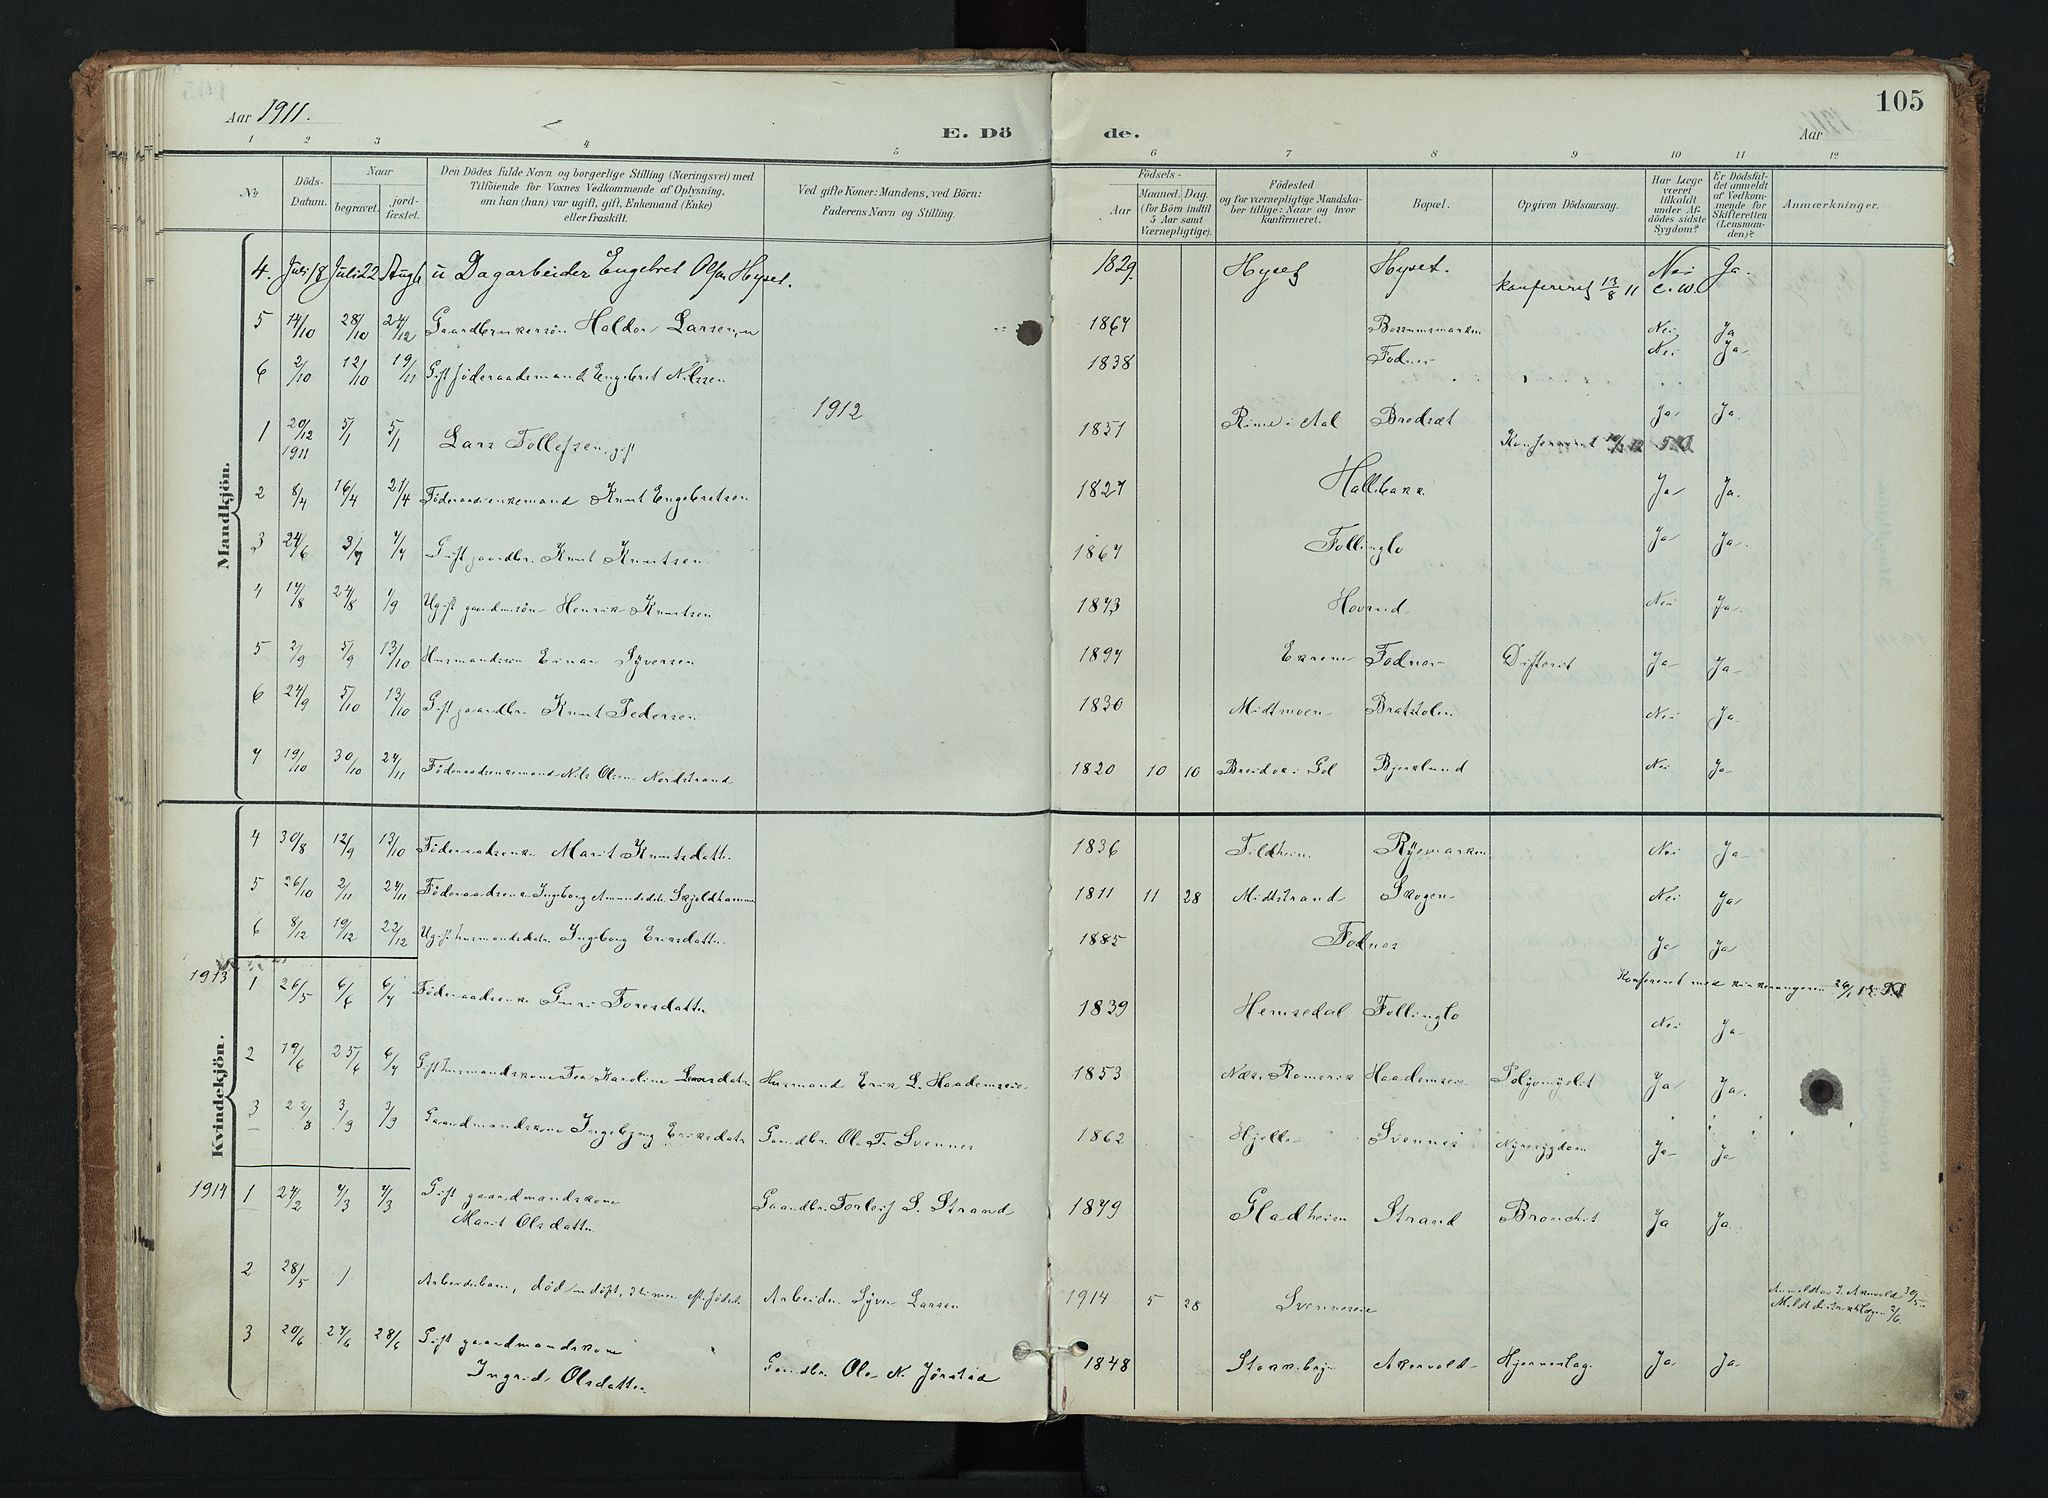 SAH, Nord-Aurdal prestekontor, Ministerialbok nr. 16, 1897-1925, s. 105